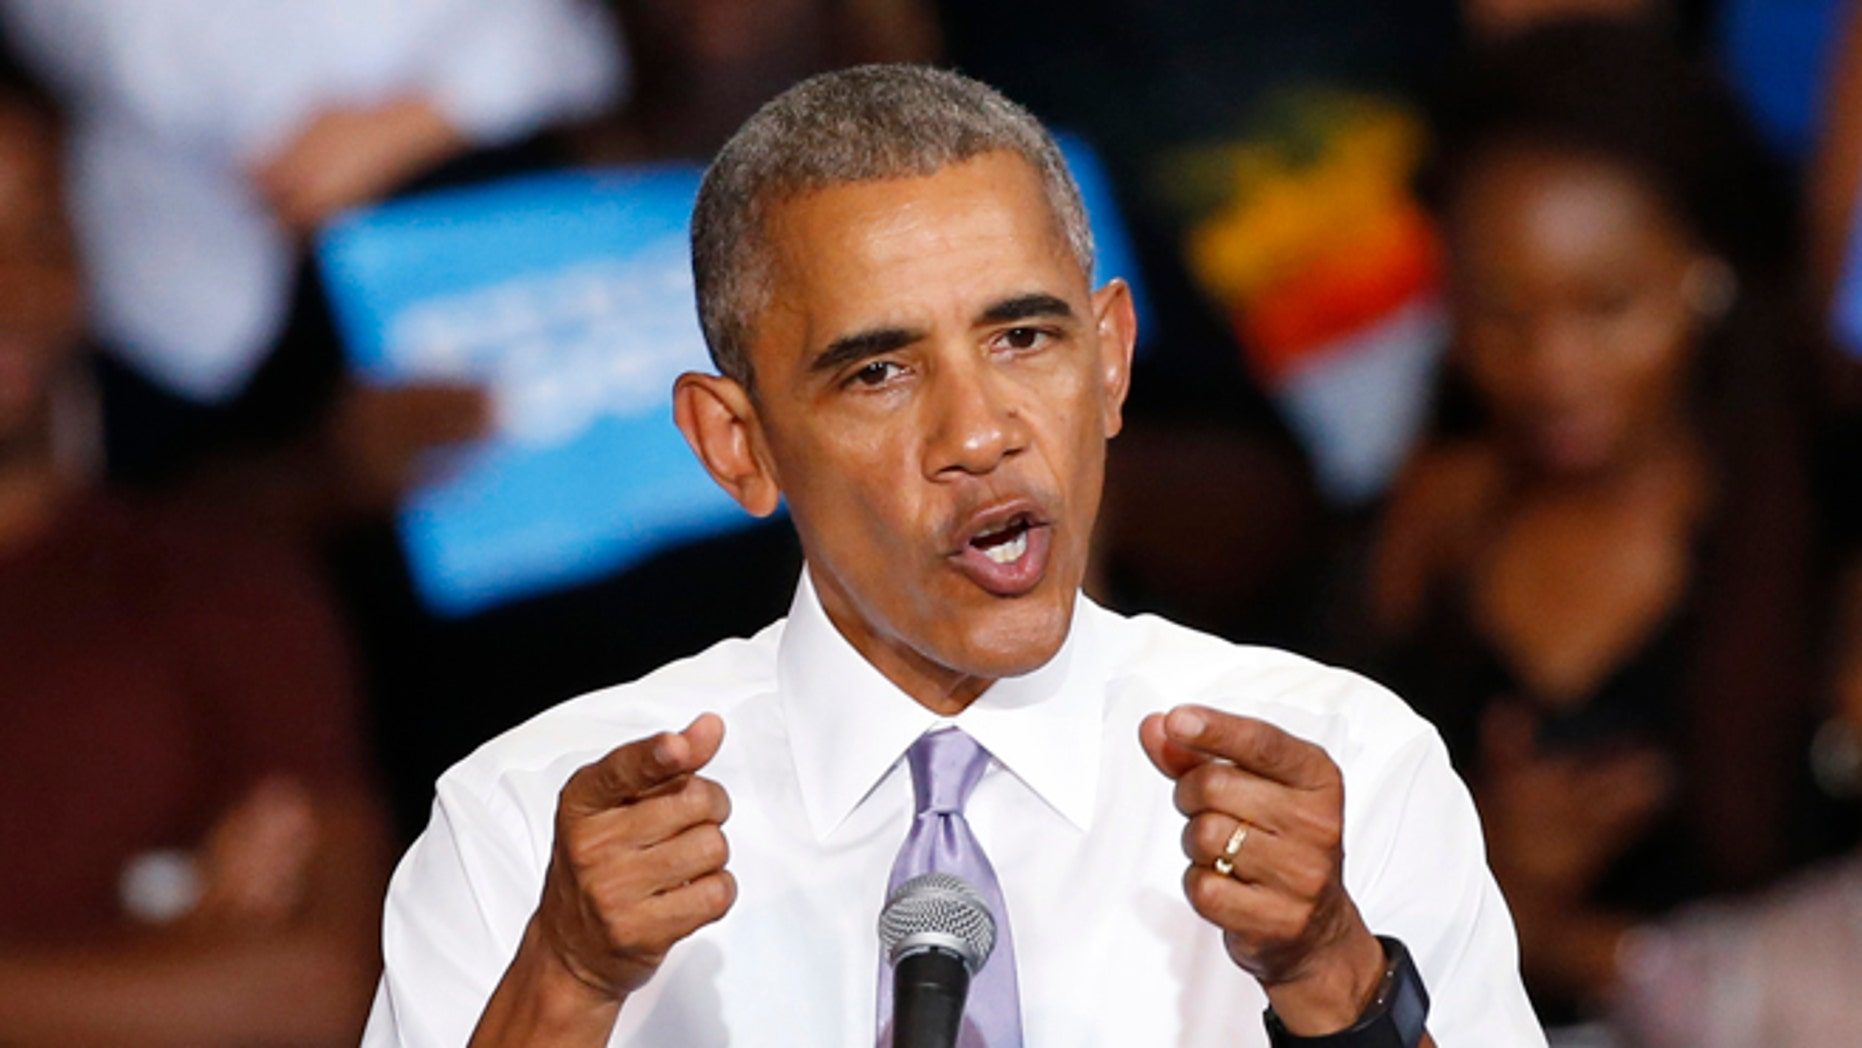 President Obama at Florida Memorial University, Thursday, Oct. 20, 2016, in Miami Gardens, Fla.